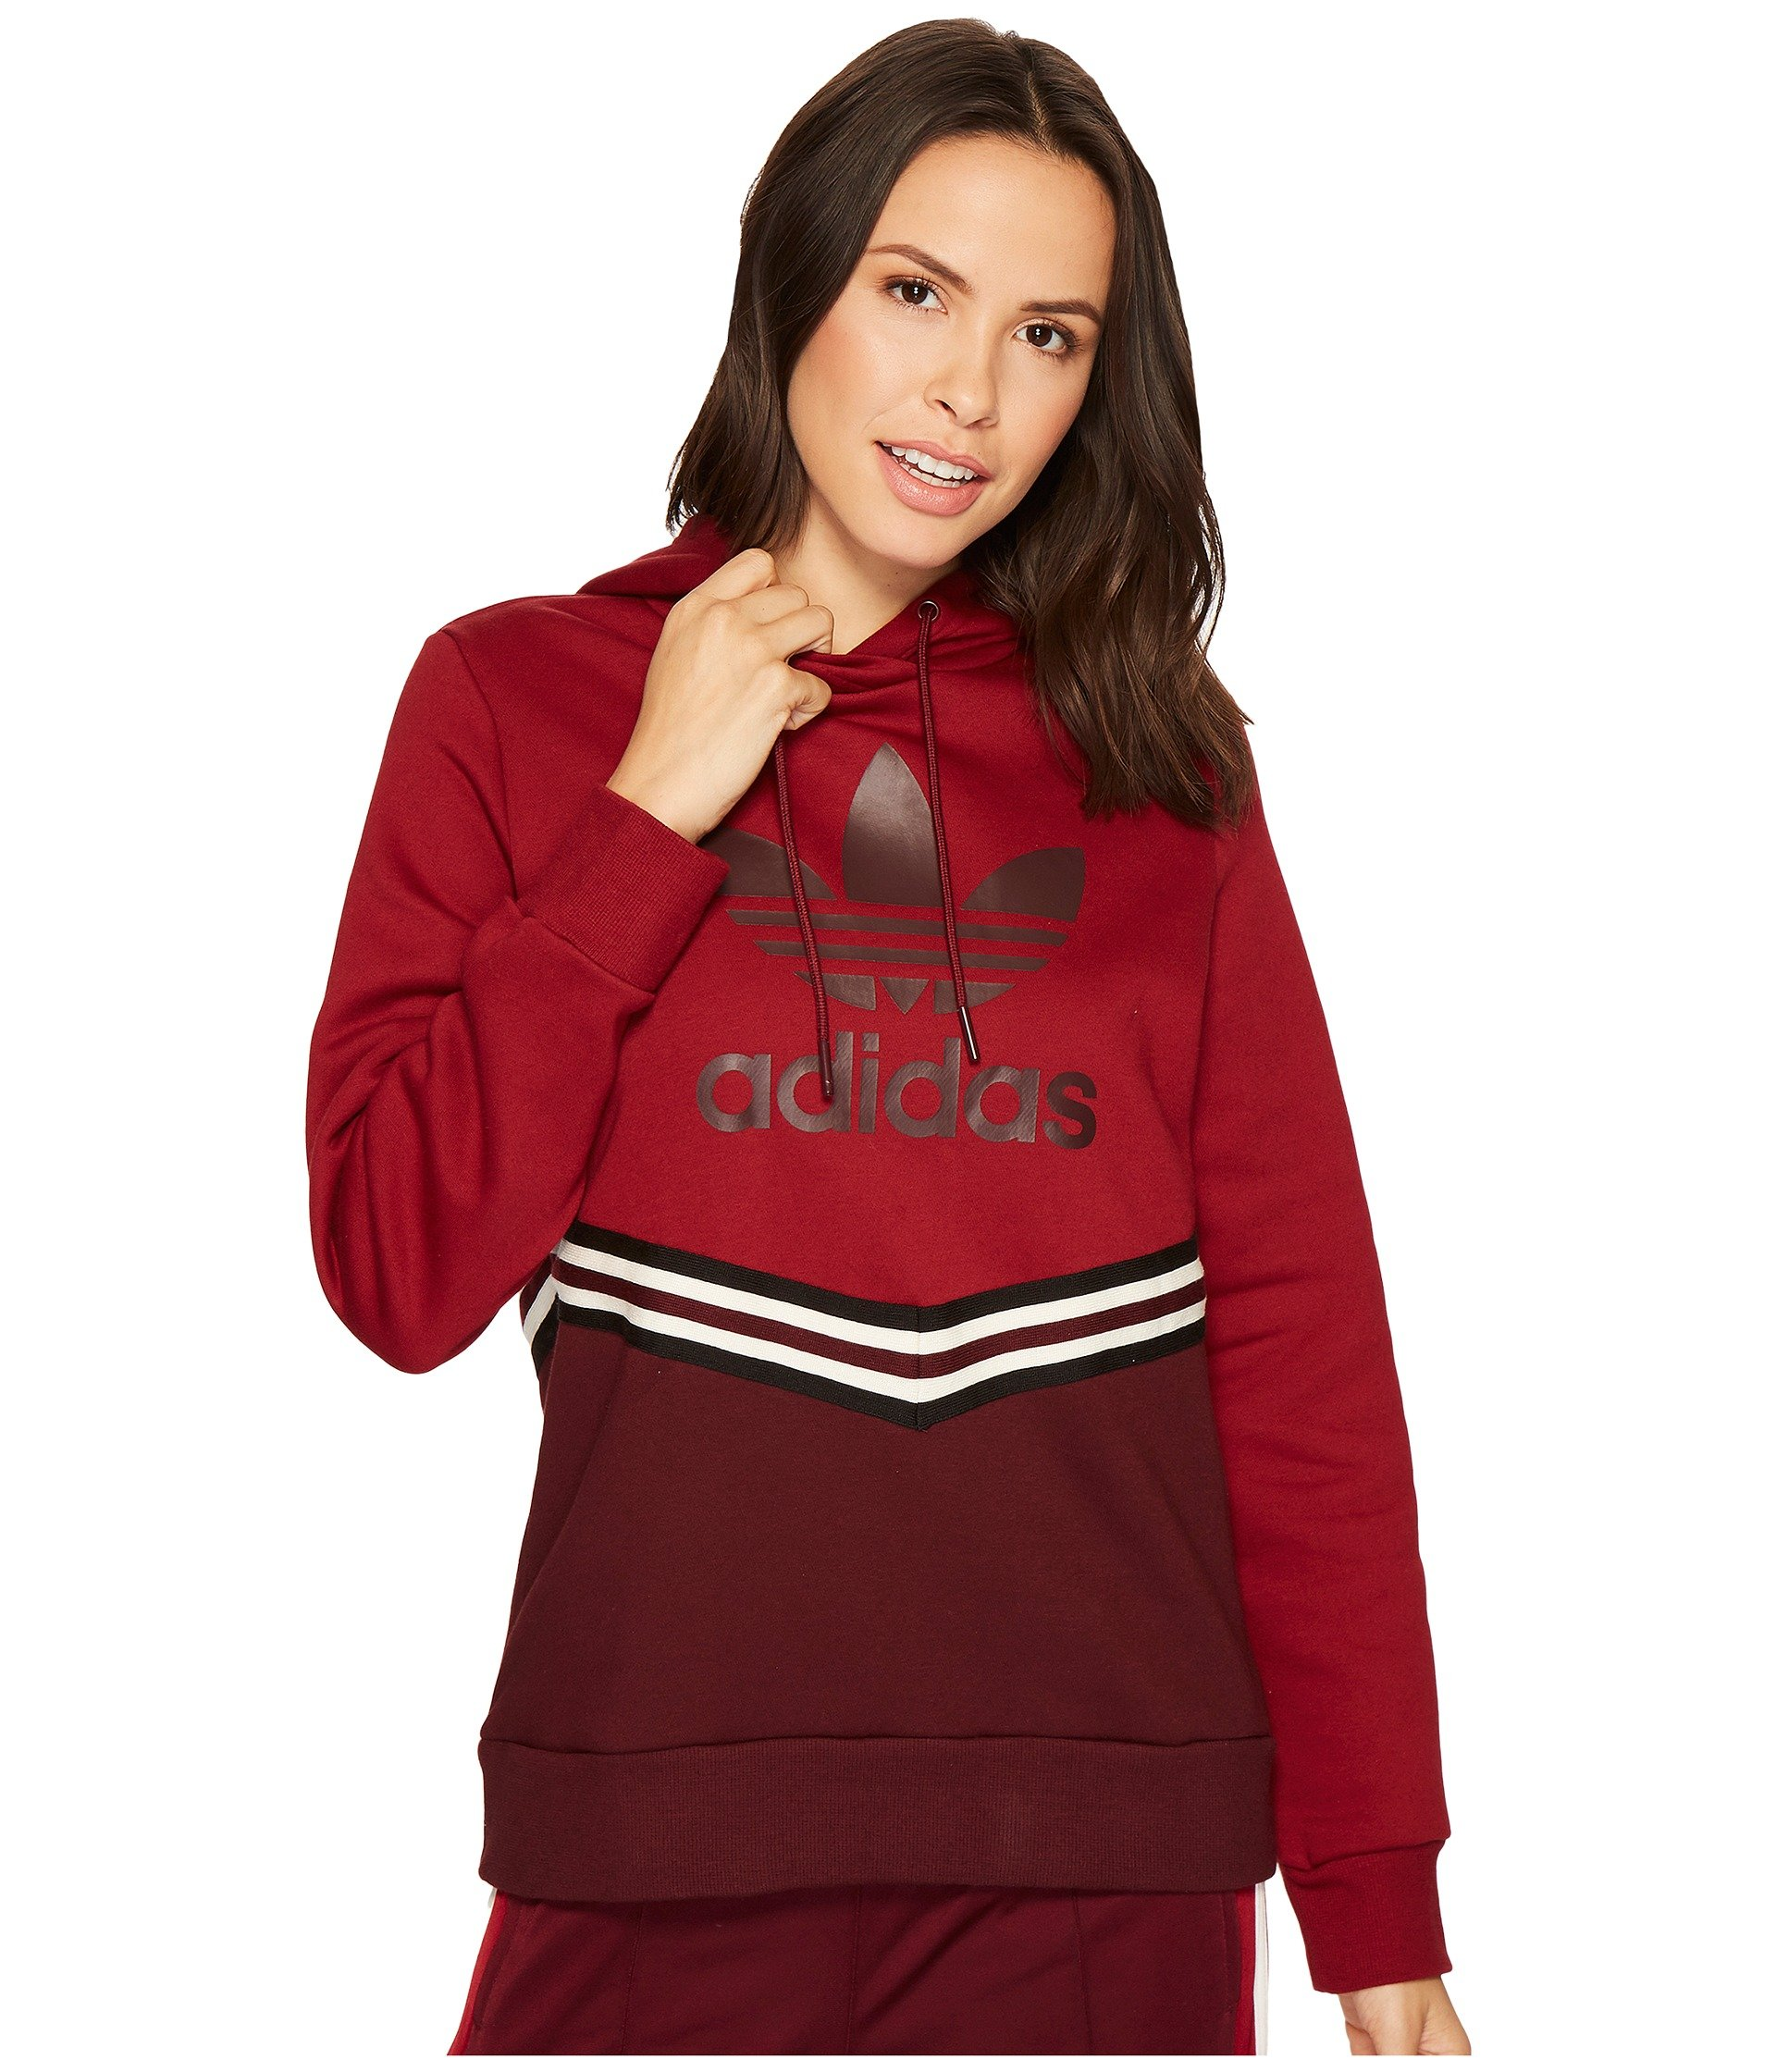 adidas Originals Women's Adi Break Hooded Sweater Maroon Large